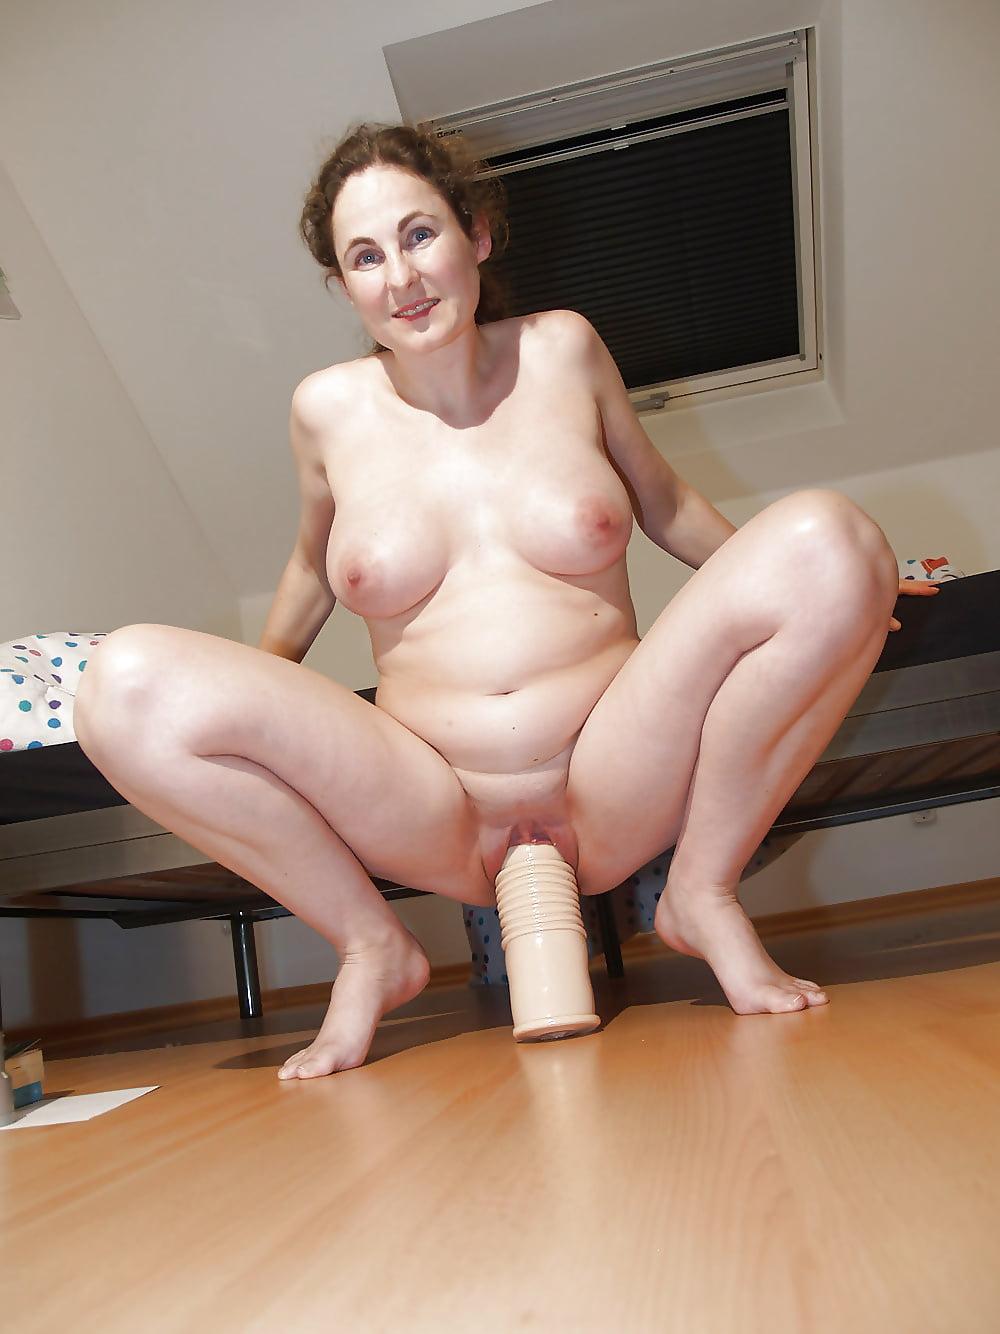 Virgin boy uses moms dildo